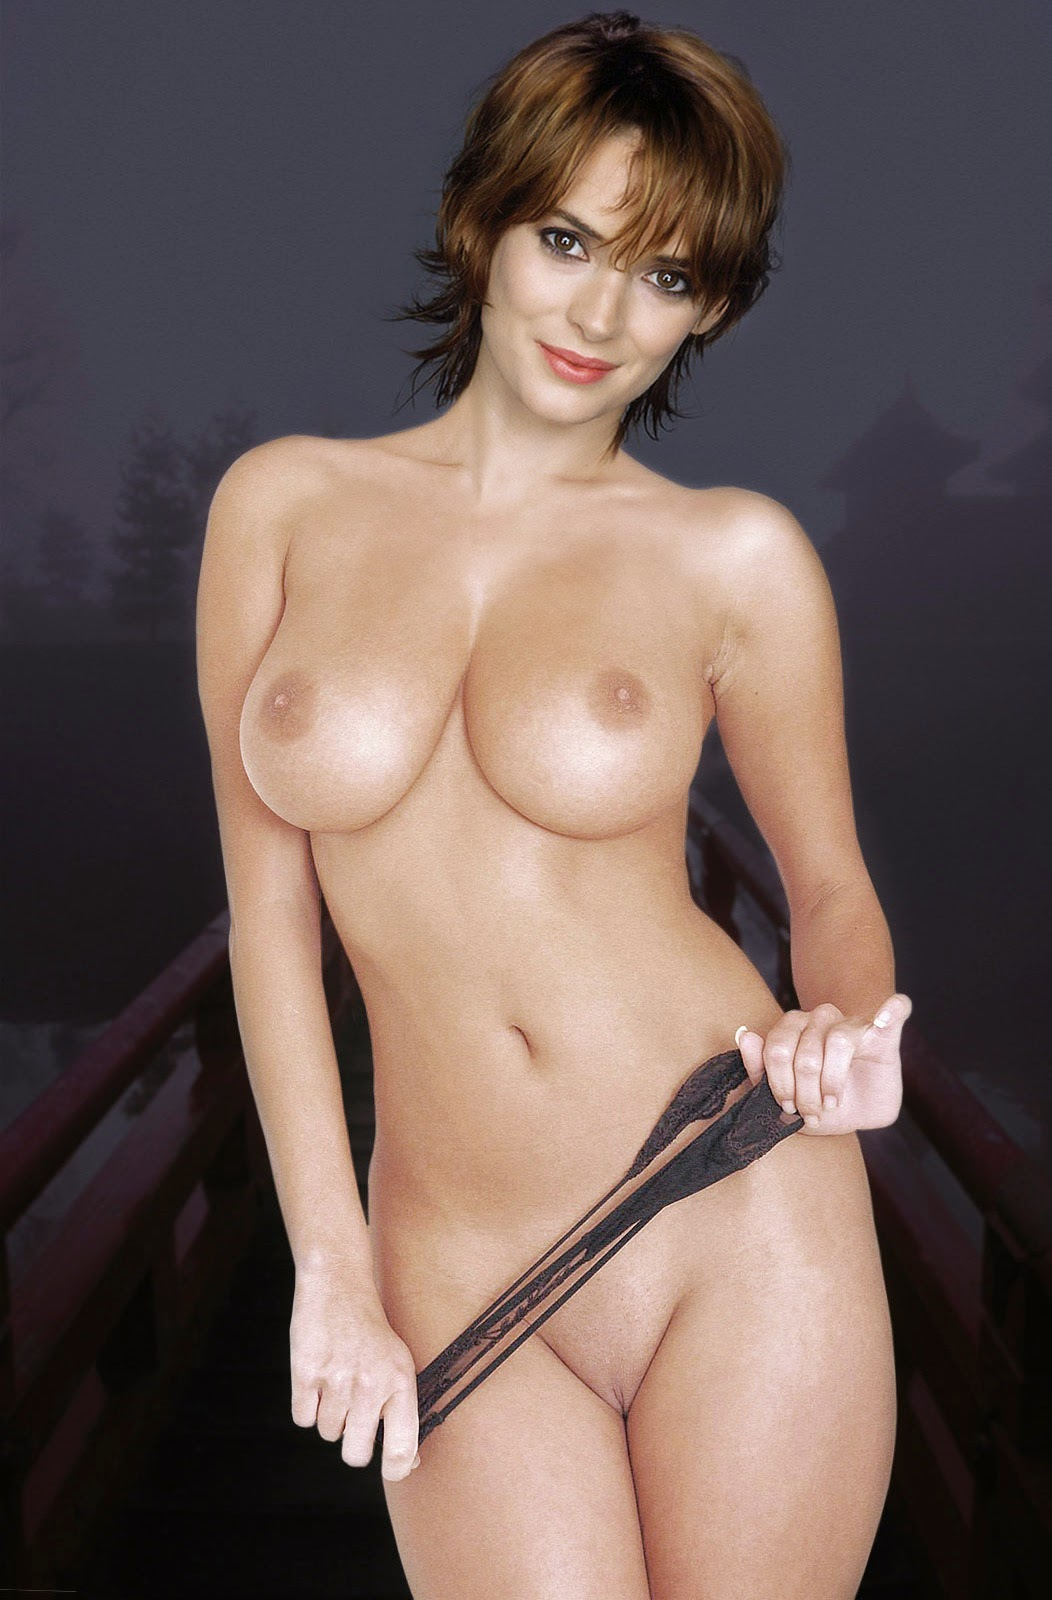 Nude Wynona Ryder nude (92 foto and video), Ass, Bikini, Instagram, panties 2006